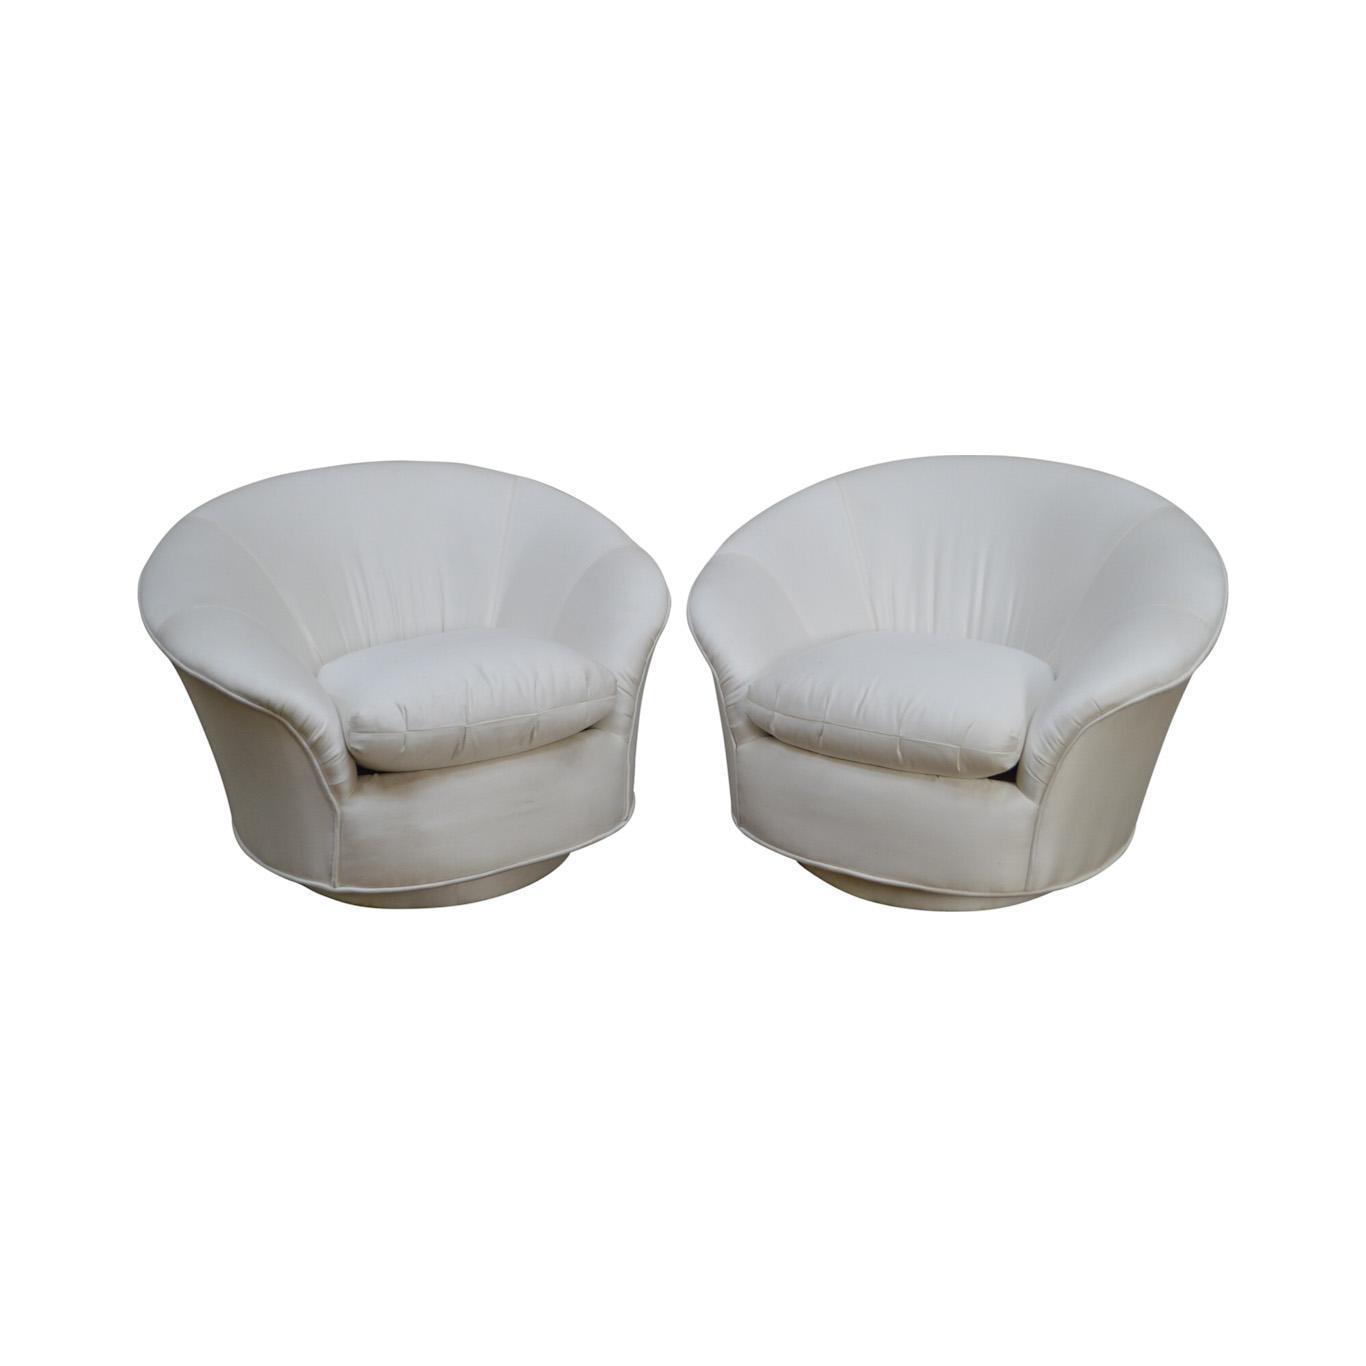 Genial Vladimir Kagan For Directional Round Swivel Base Pair Of Lounge Chairs